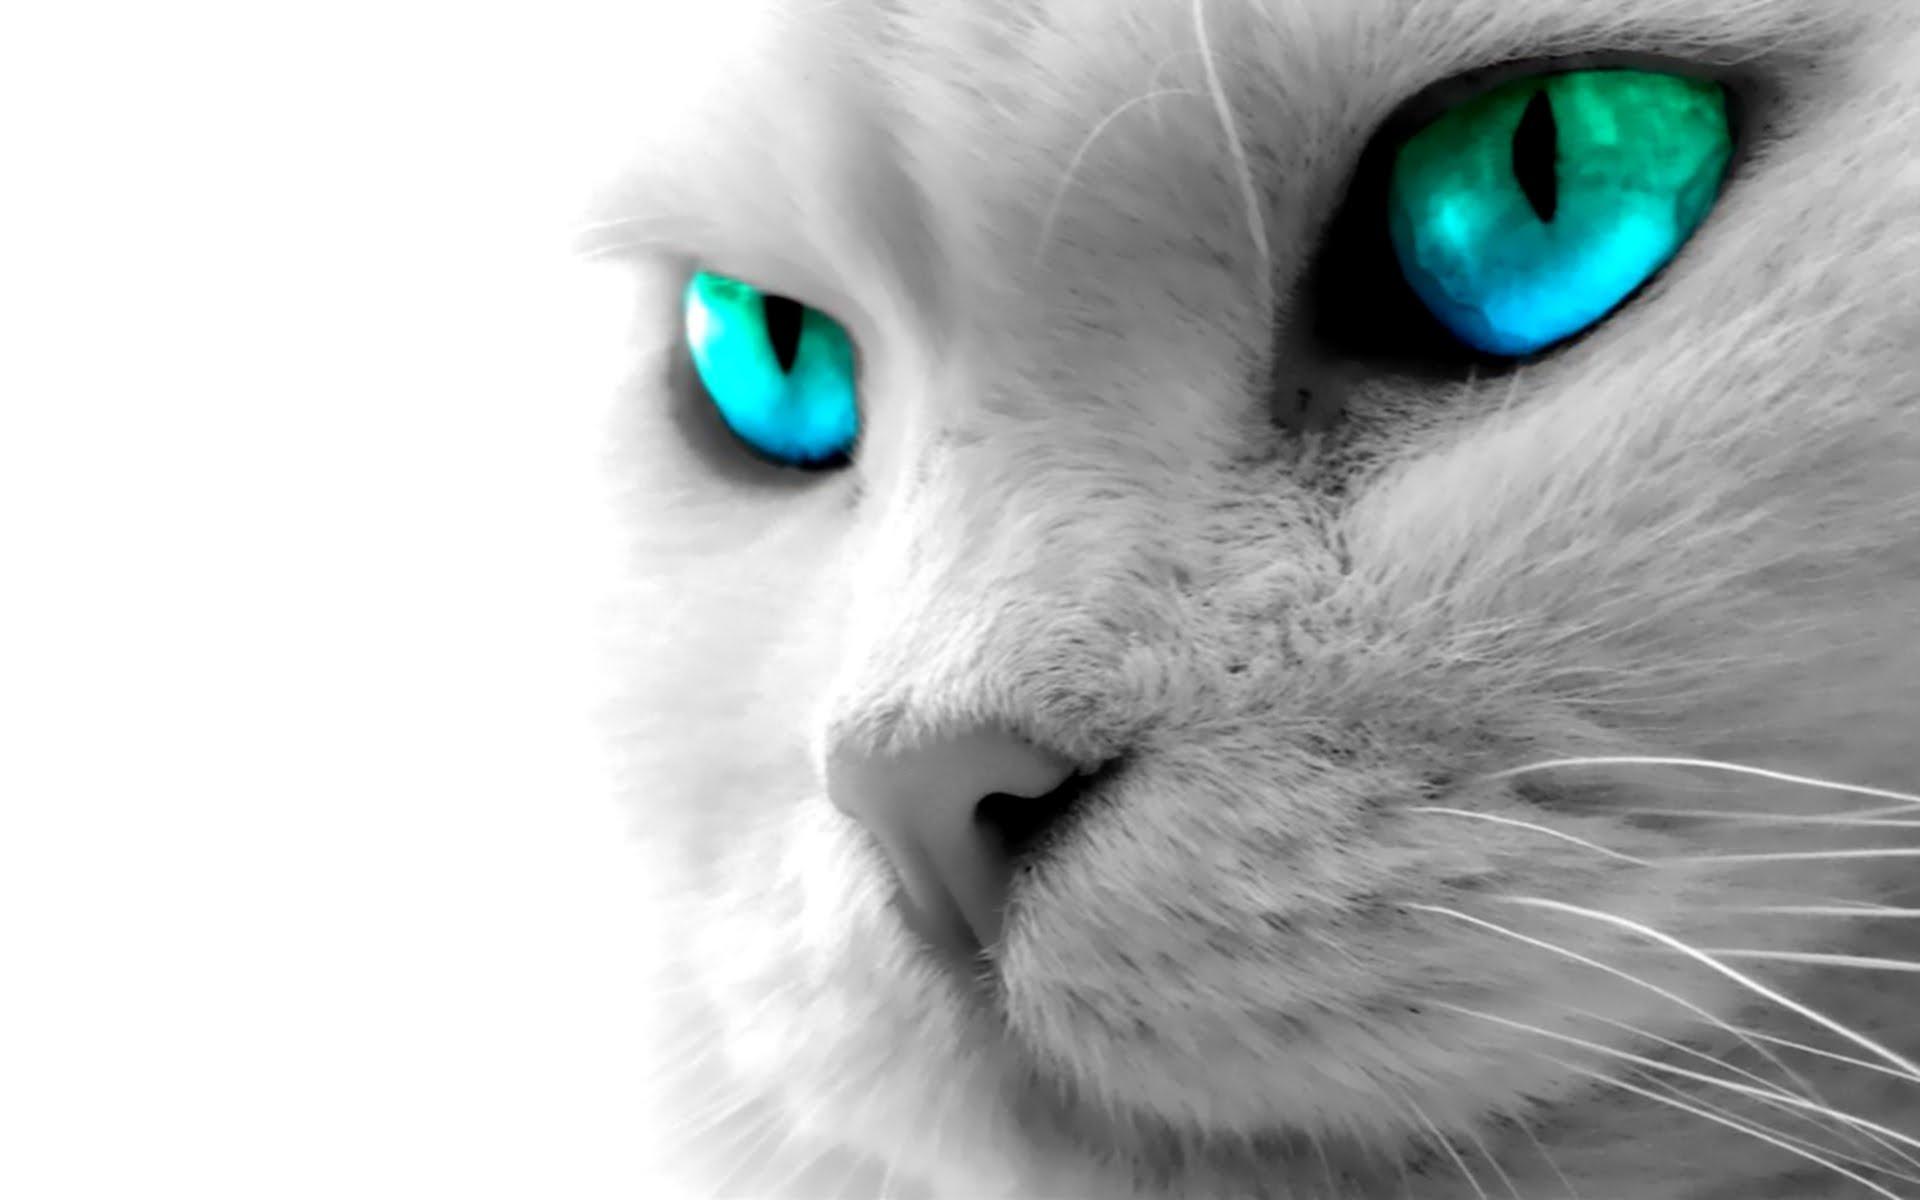 beautiful cat with blue digital eye - hd wallpaper